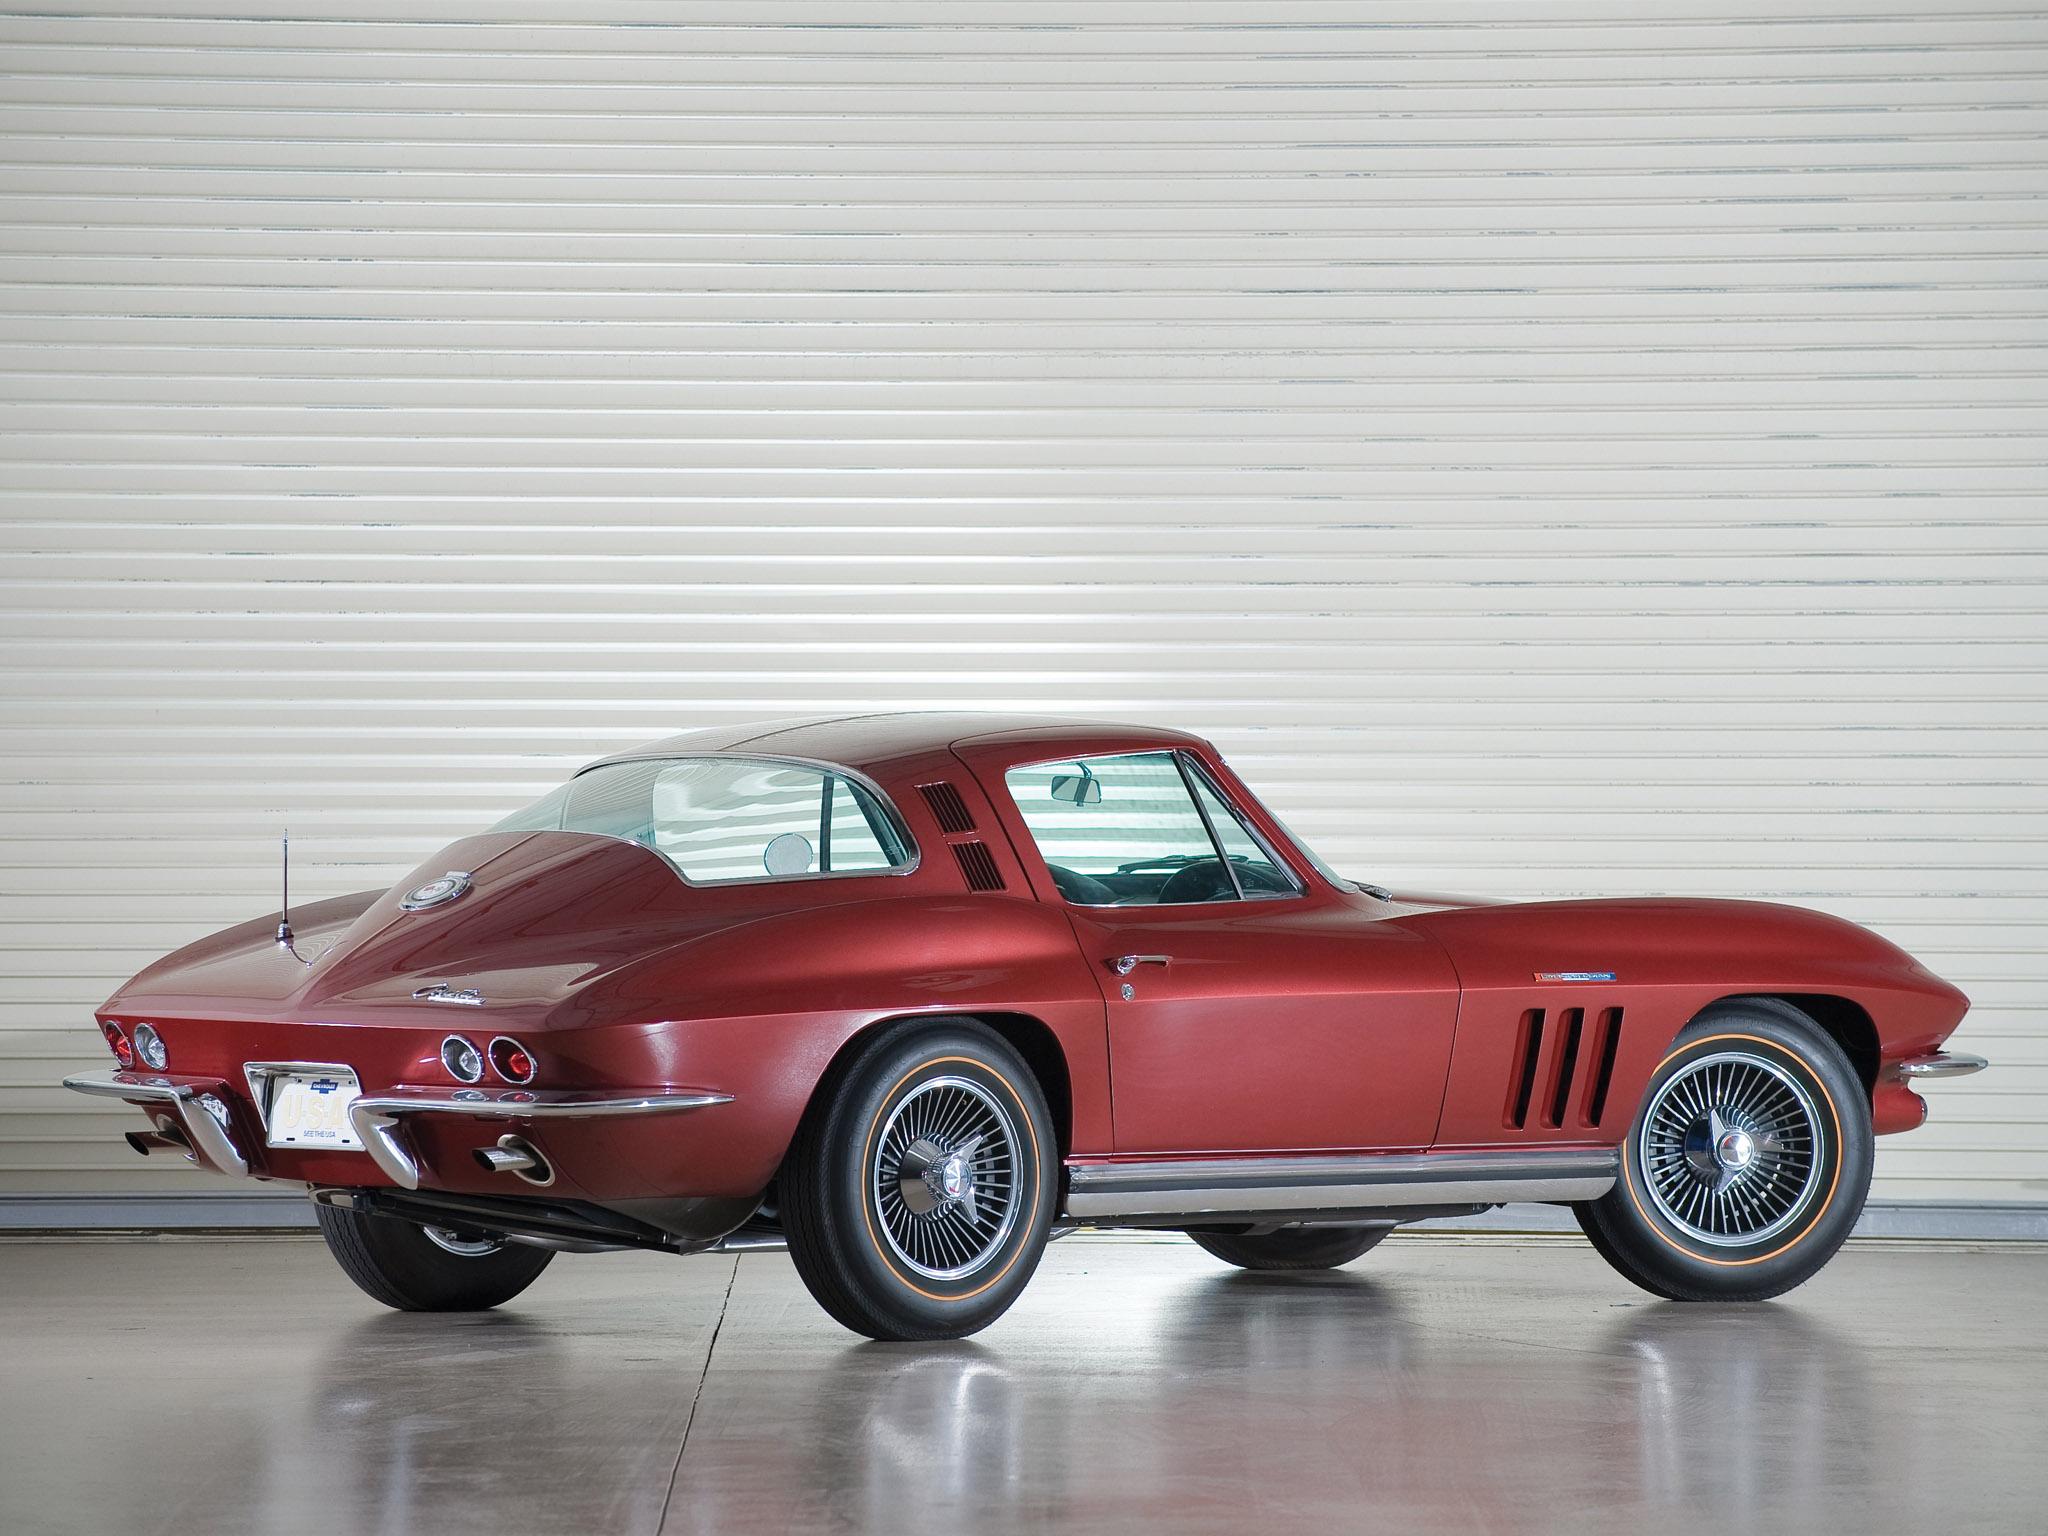 1965 corvette wallpaper - photo #11